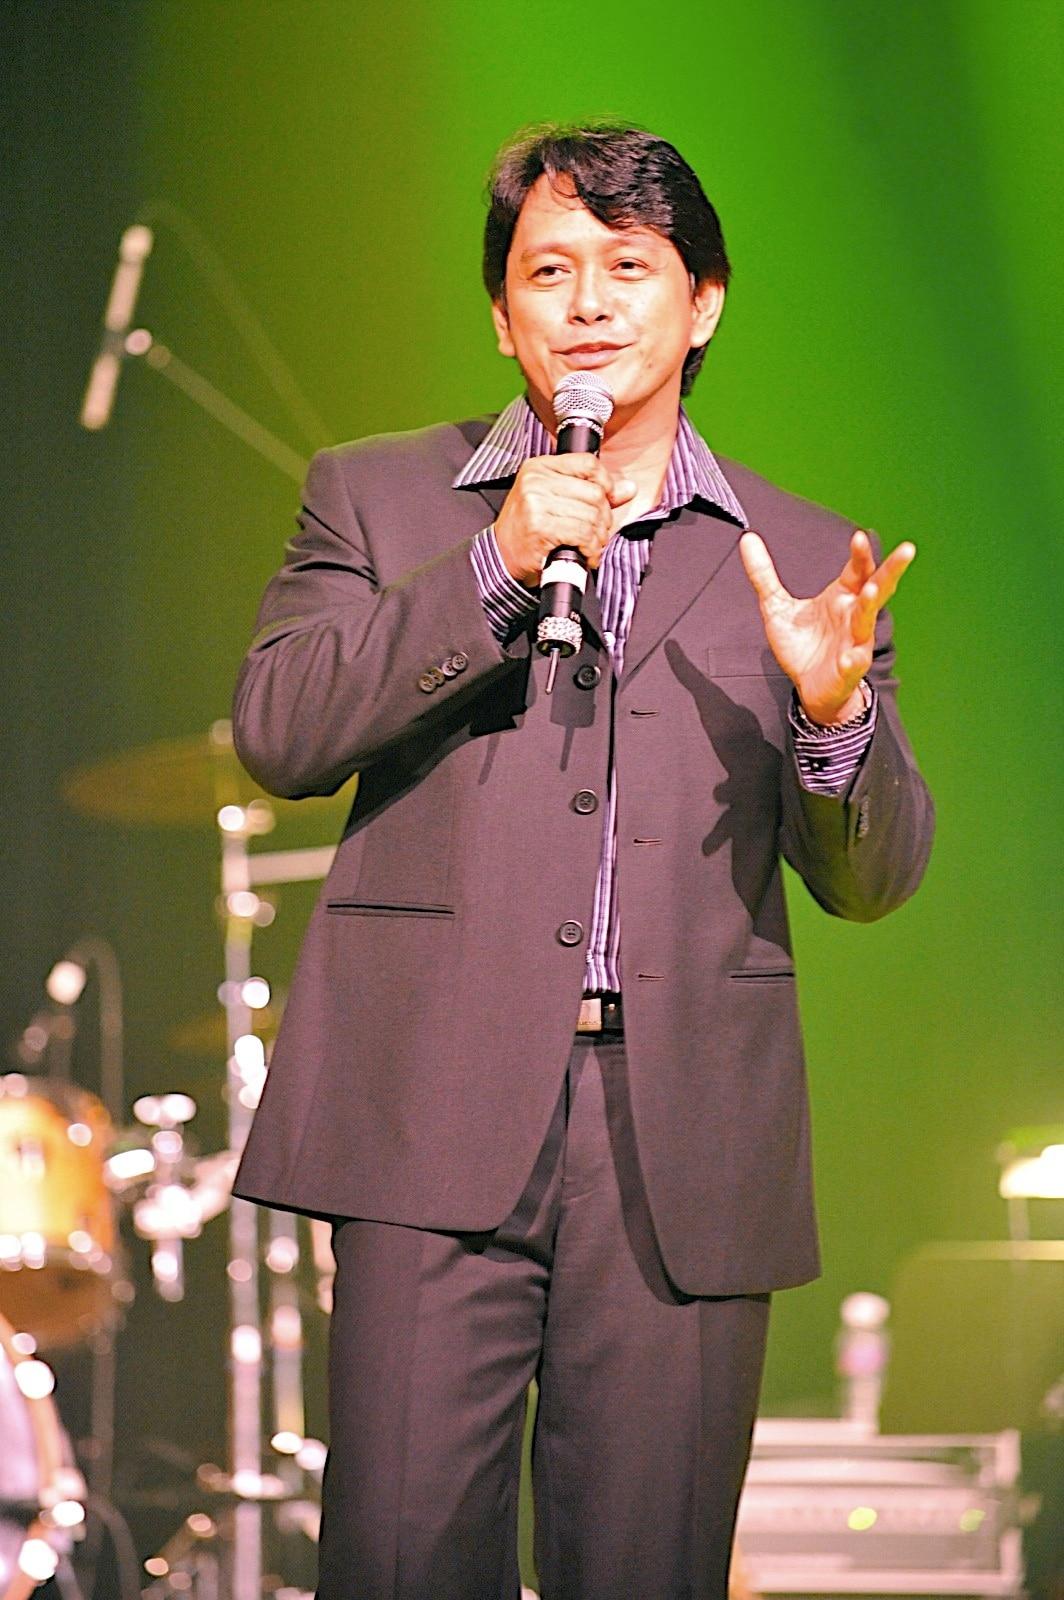 Marco Sison